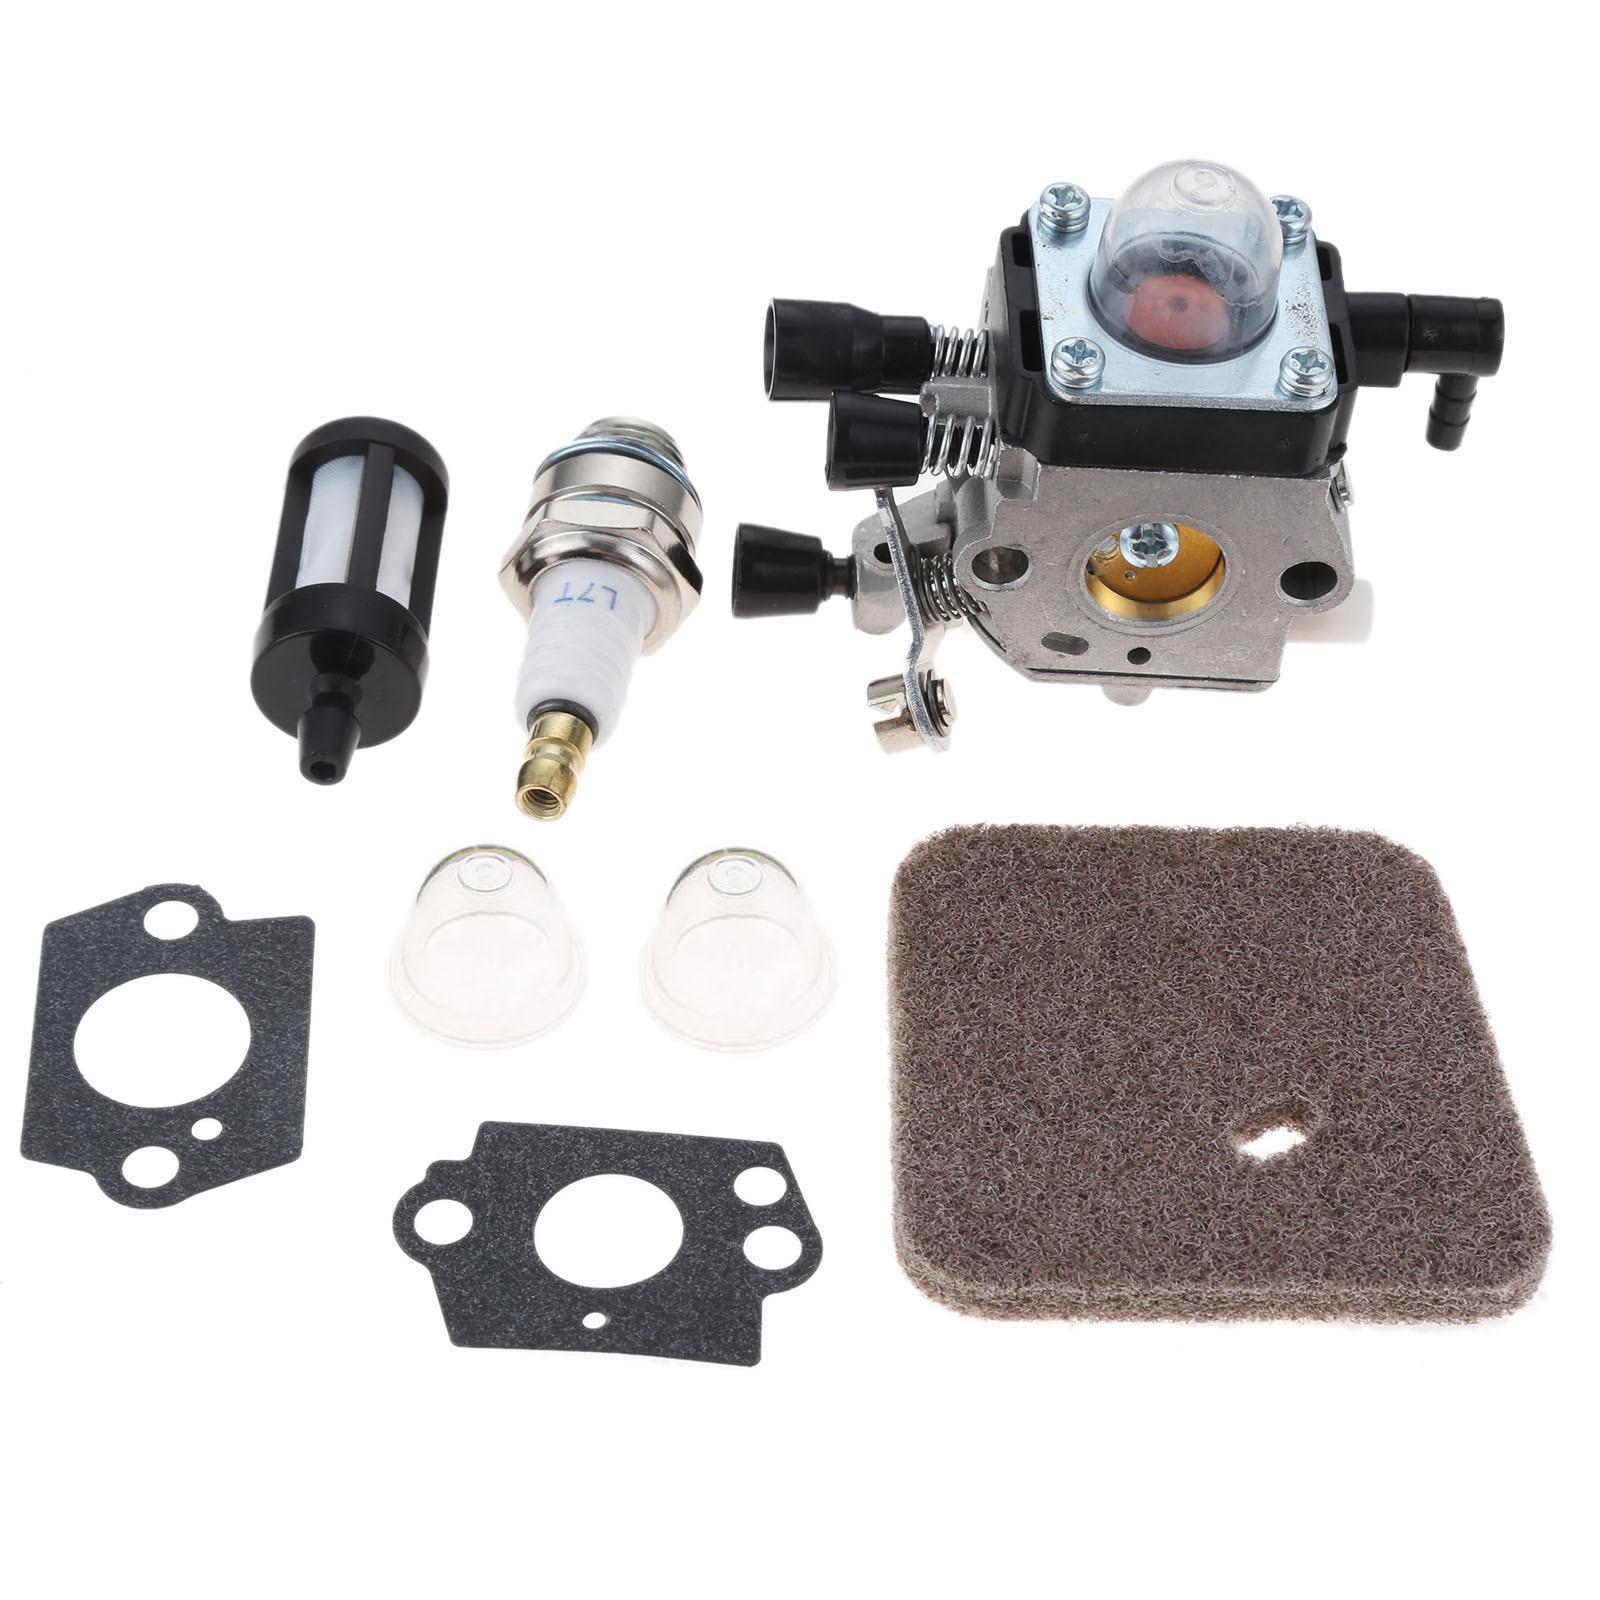 DRELD C1Q-S186 carburador con filtro de aire melodía Kit apto para STIHL FS38 FS45 FS46 FS46C FS55 FS55R de Trimmer de cortadora de césped